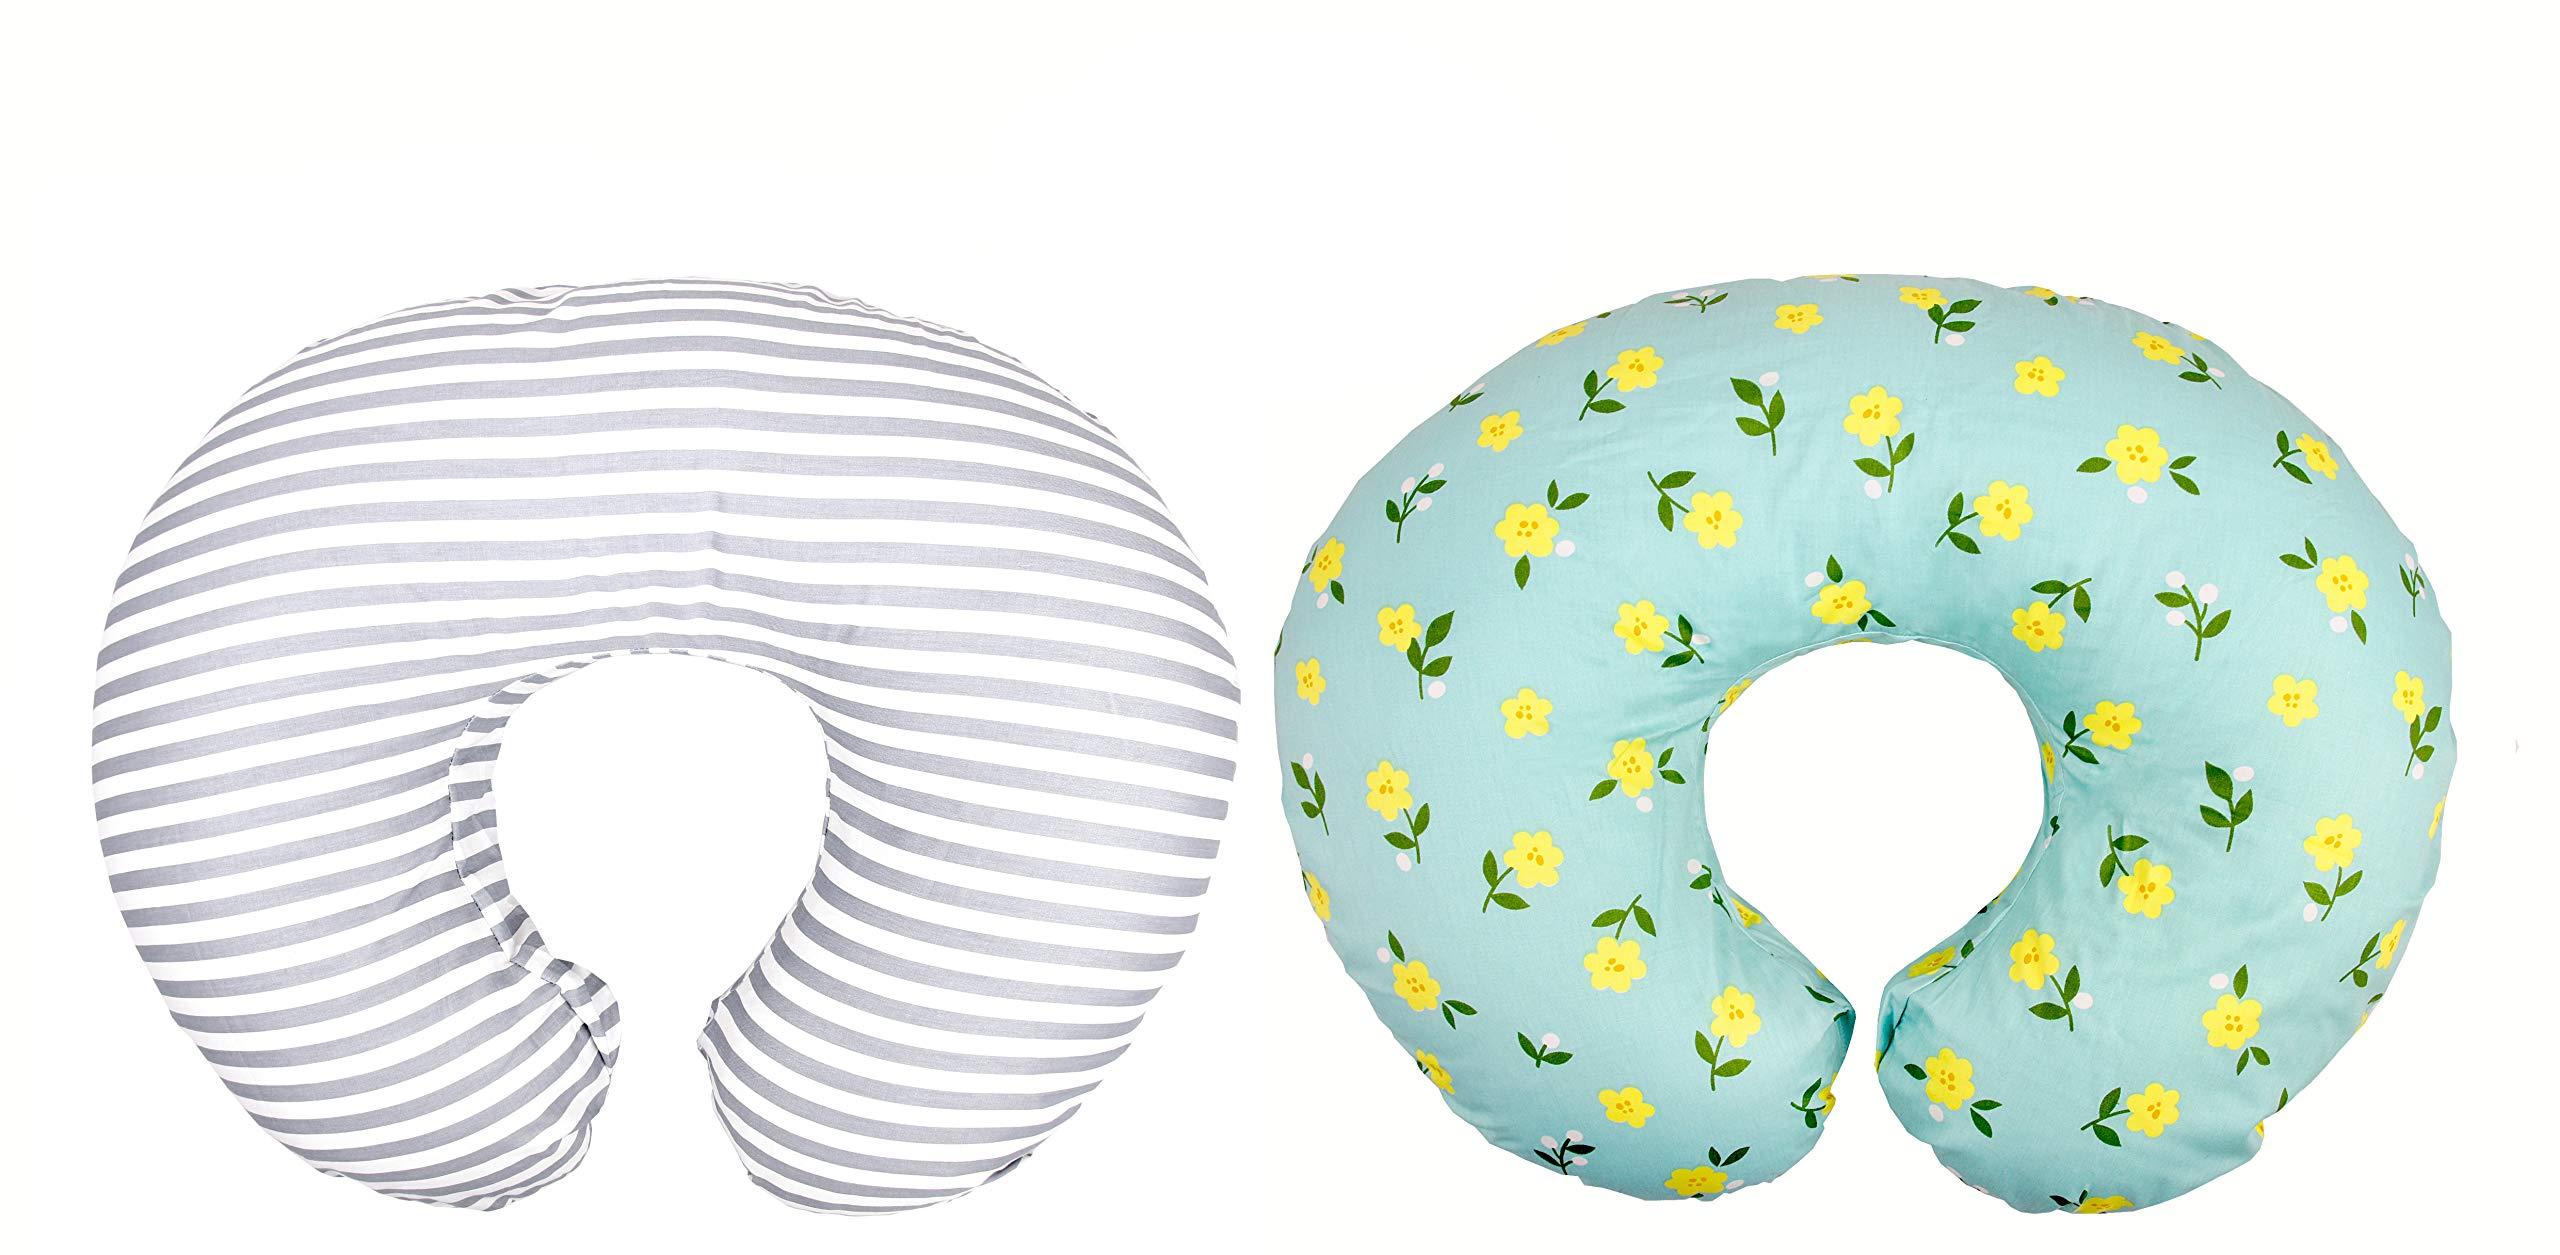 Premium Quality 2 Pack Nursing Pillow Covers by Mila Millie | Baby Girl Chic Flower Design | Gray Stripes Unisex Slipcover | 100% Cotton Hypoallergenic | Breastfeeding | Shower Gift | Fits Boppy by Mila Millie